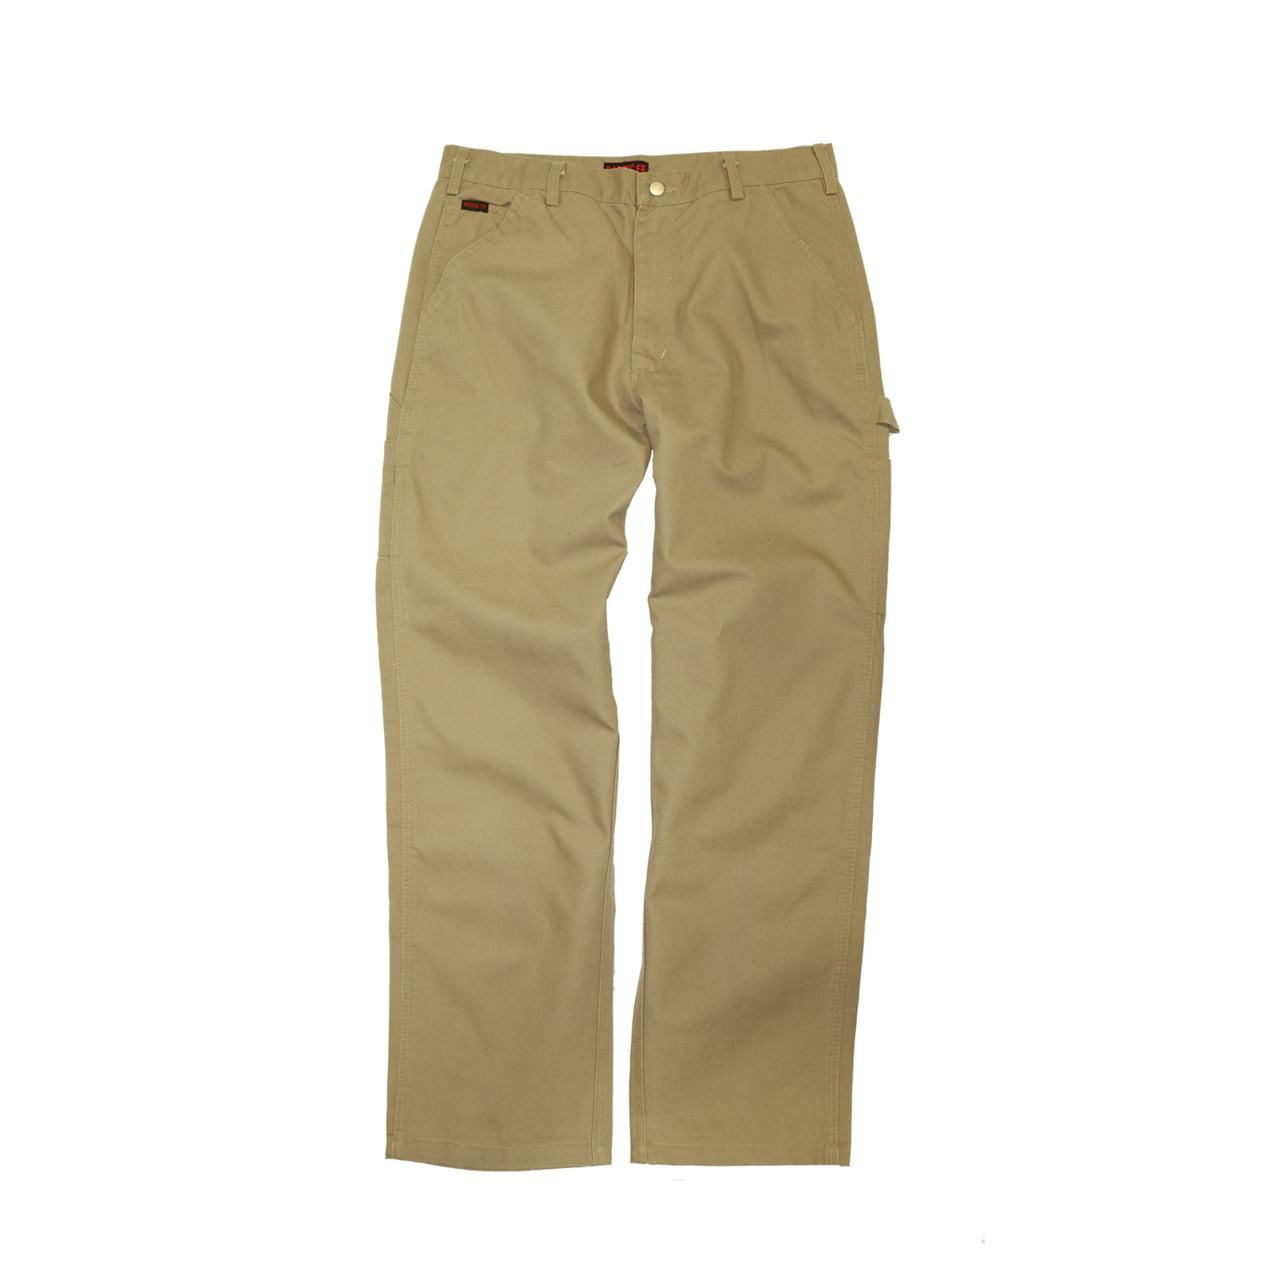 Rasco FR Khaki Carpenter Pants - Walmart.com